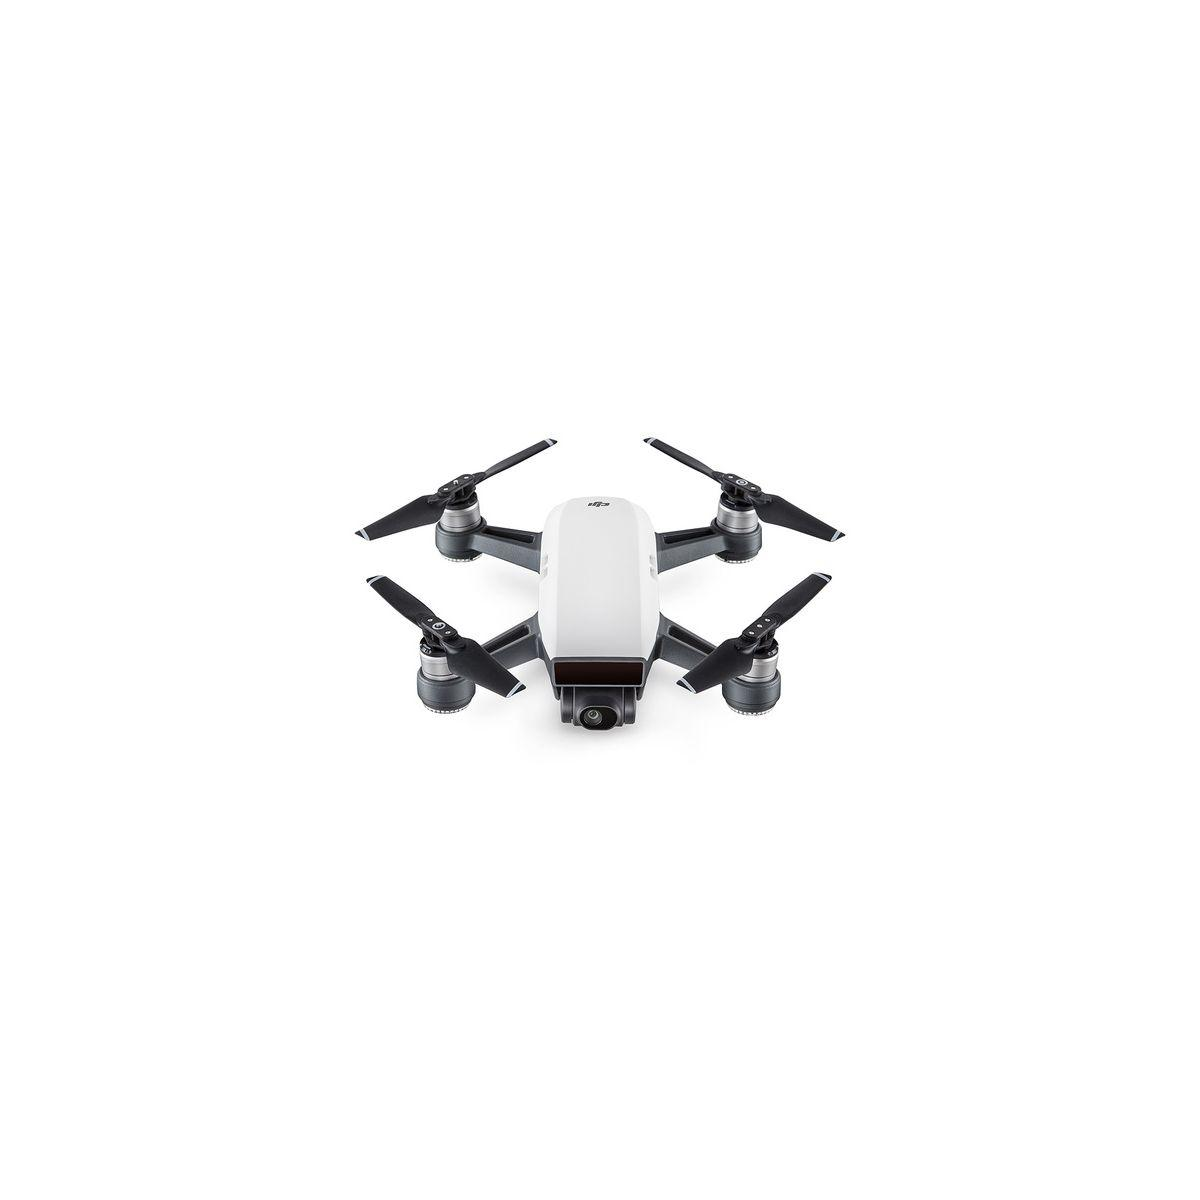 Drones dji dji-spark - 2% de remise immédiate avec le code : cool2 (photo)